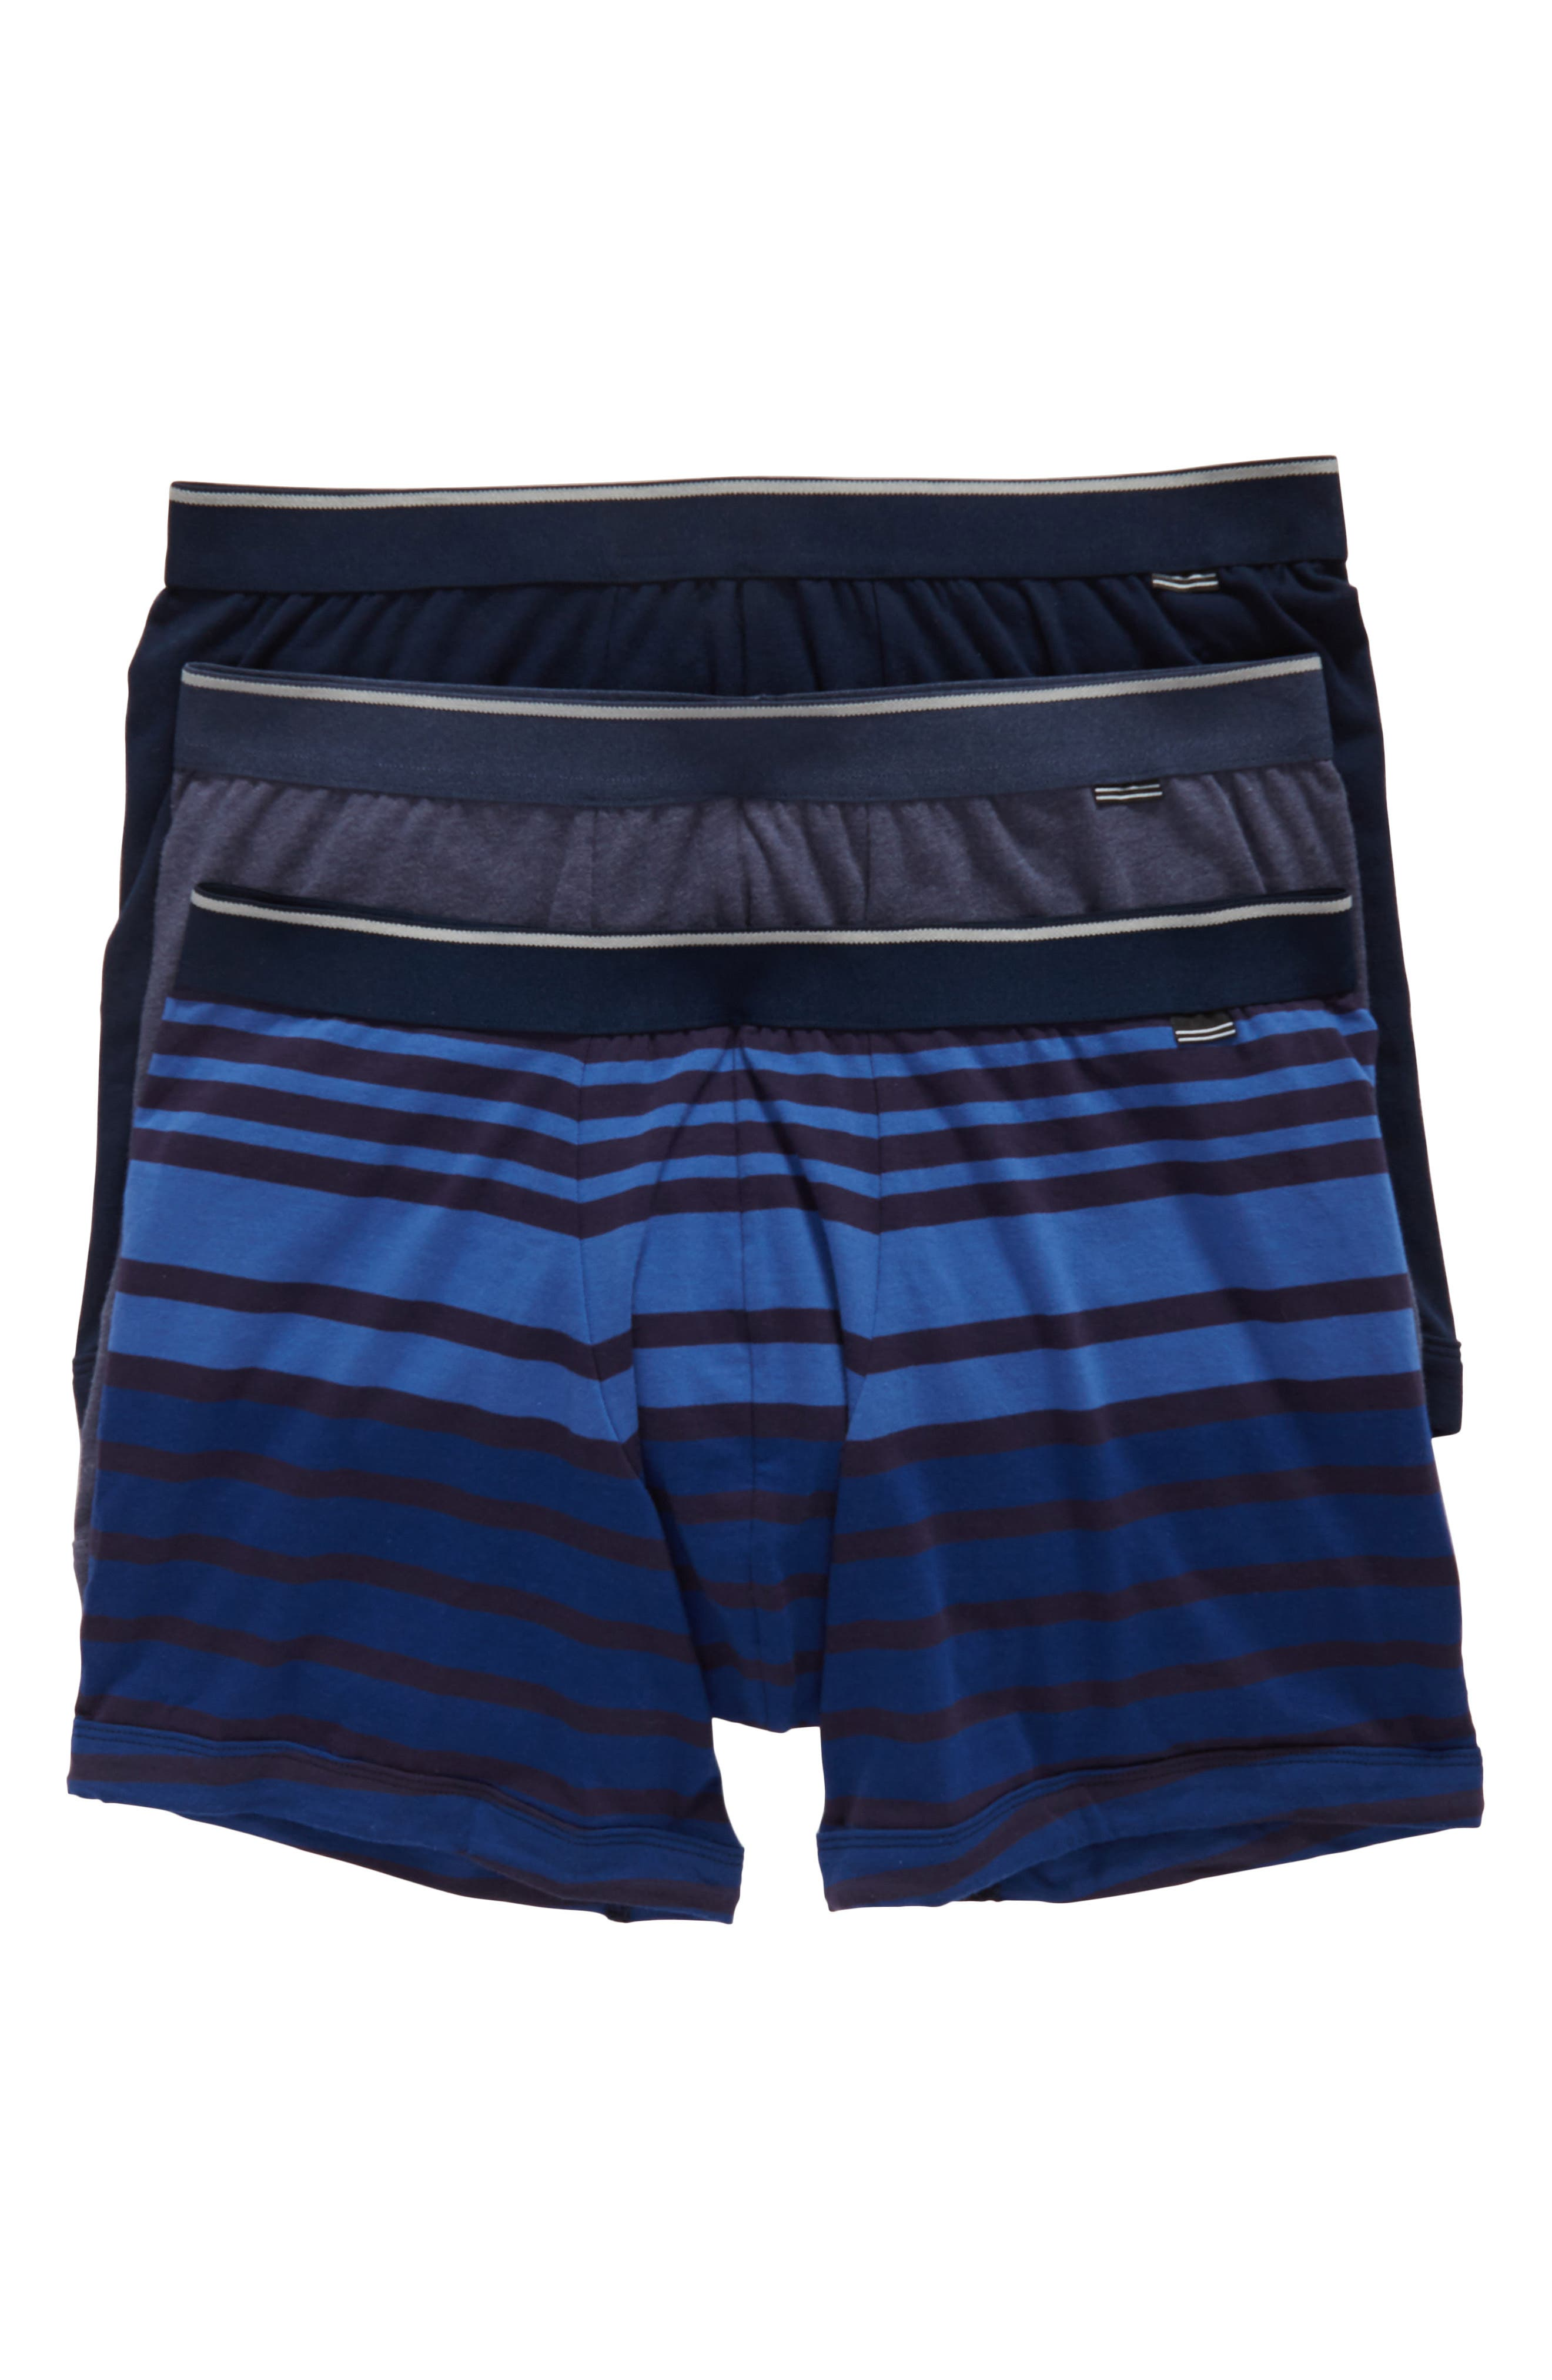 3-Pack Boxer Briefs,                         Main,                         color, Navy/ Navy-Blue Stripe